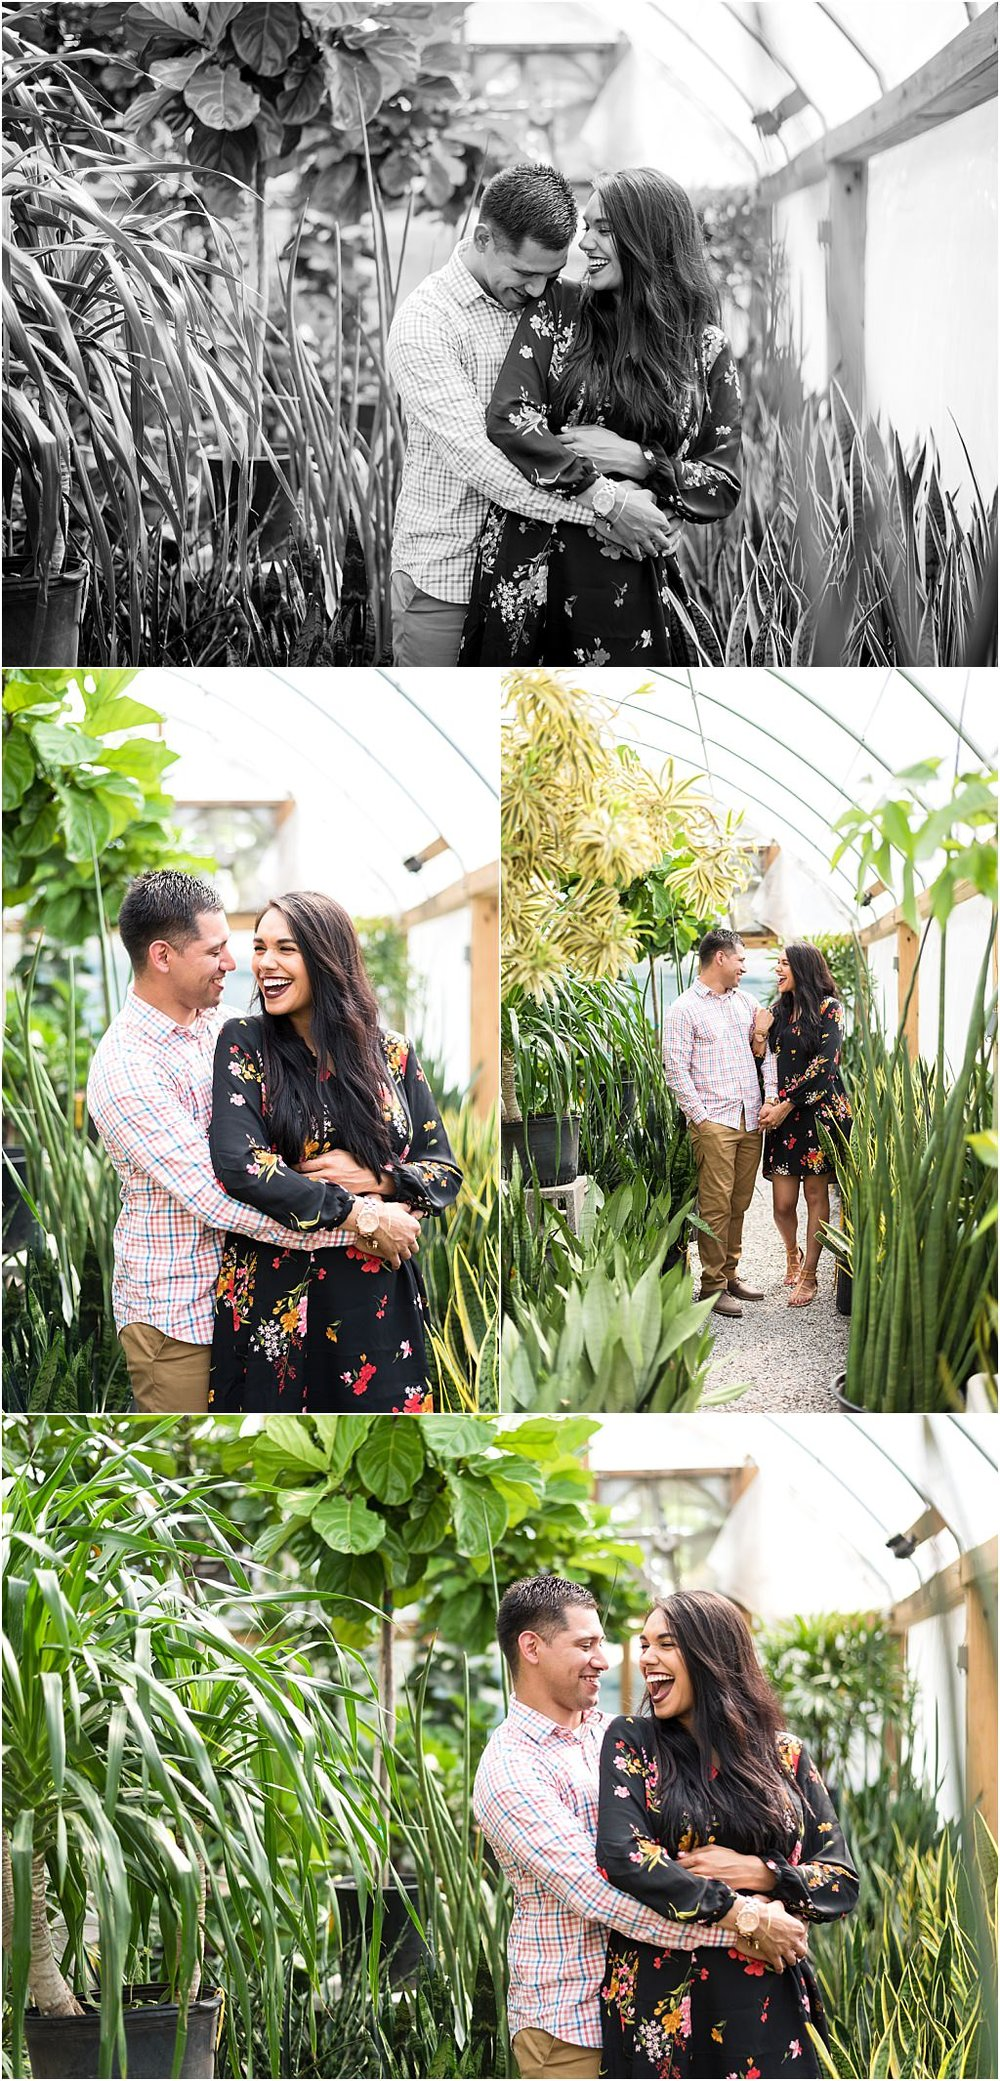 Hewitt-Garden-Center-Green-House-Phoography-Session-Pregnancy-Announcement-Nashville-Lifestyle-Photographer+6